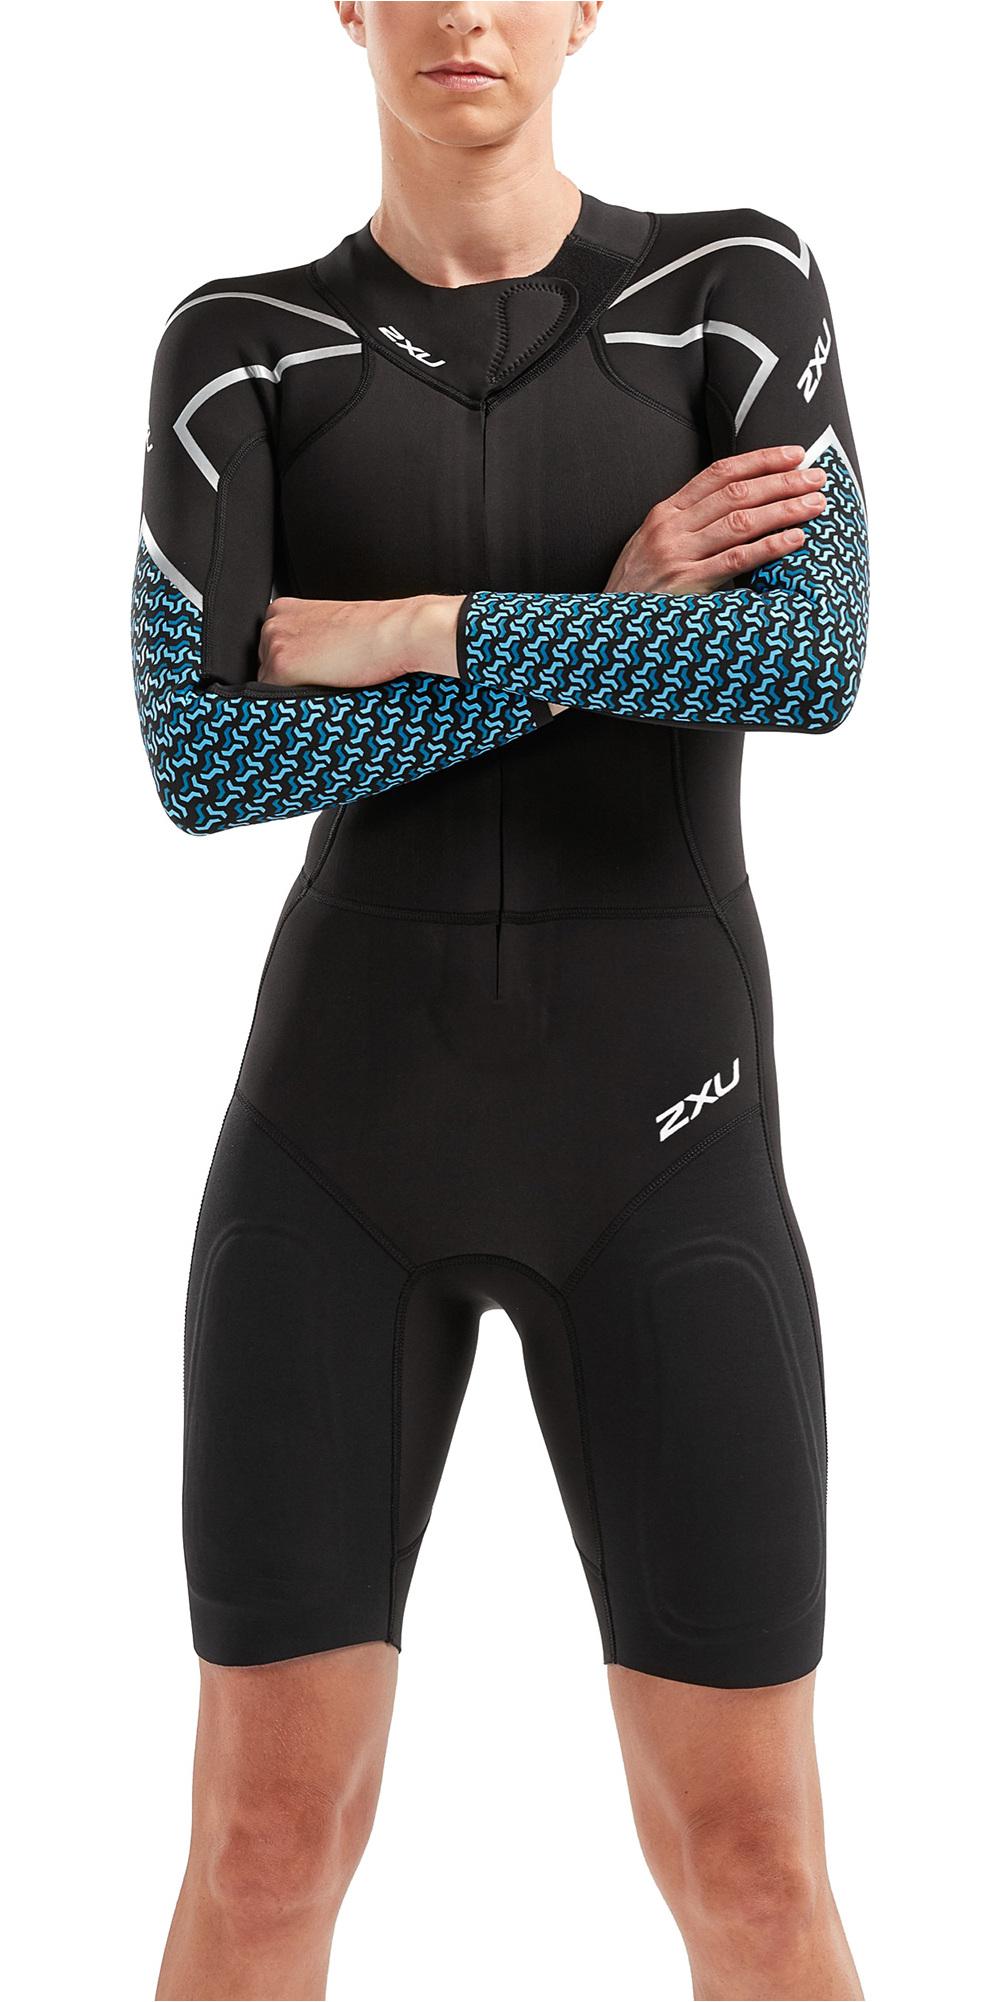 c9d5e3b5c2 2019 2XU Womens Pro Swim-run Sr1 Wetsuit Black Aquarius Teal Print Ww5480c  - Womens | Wetsuit Outlet